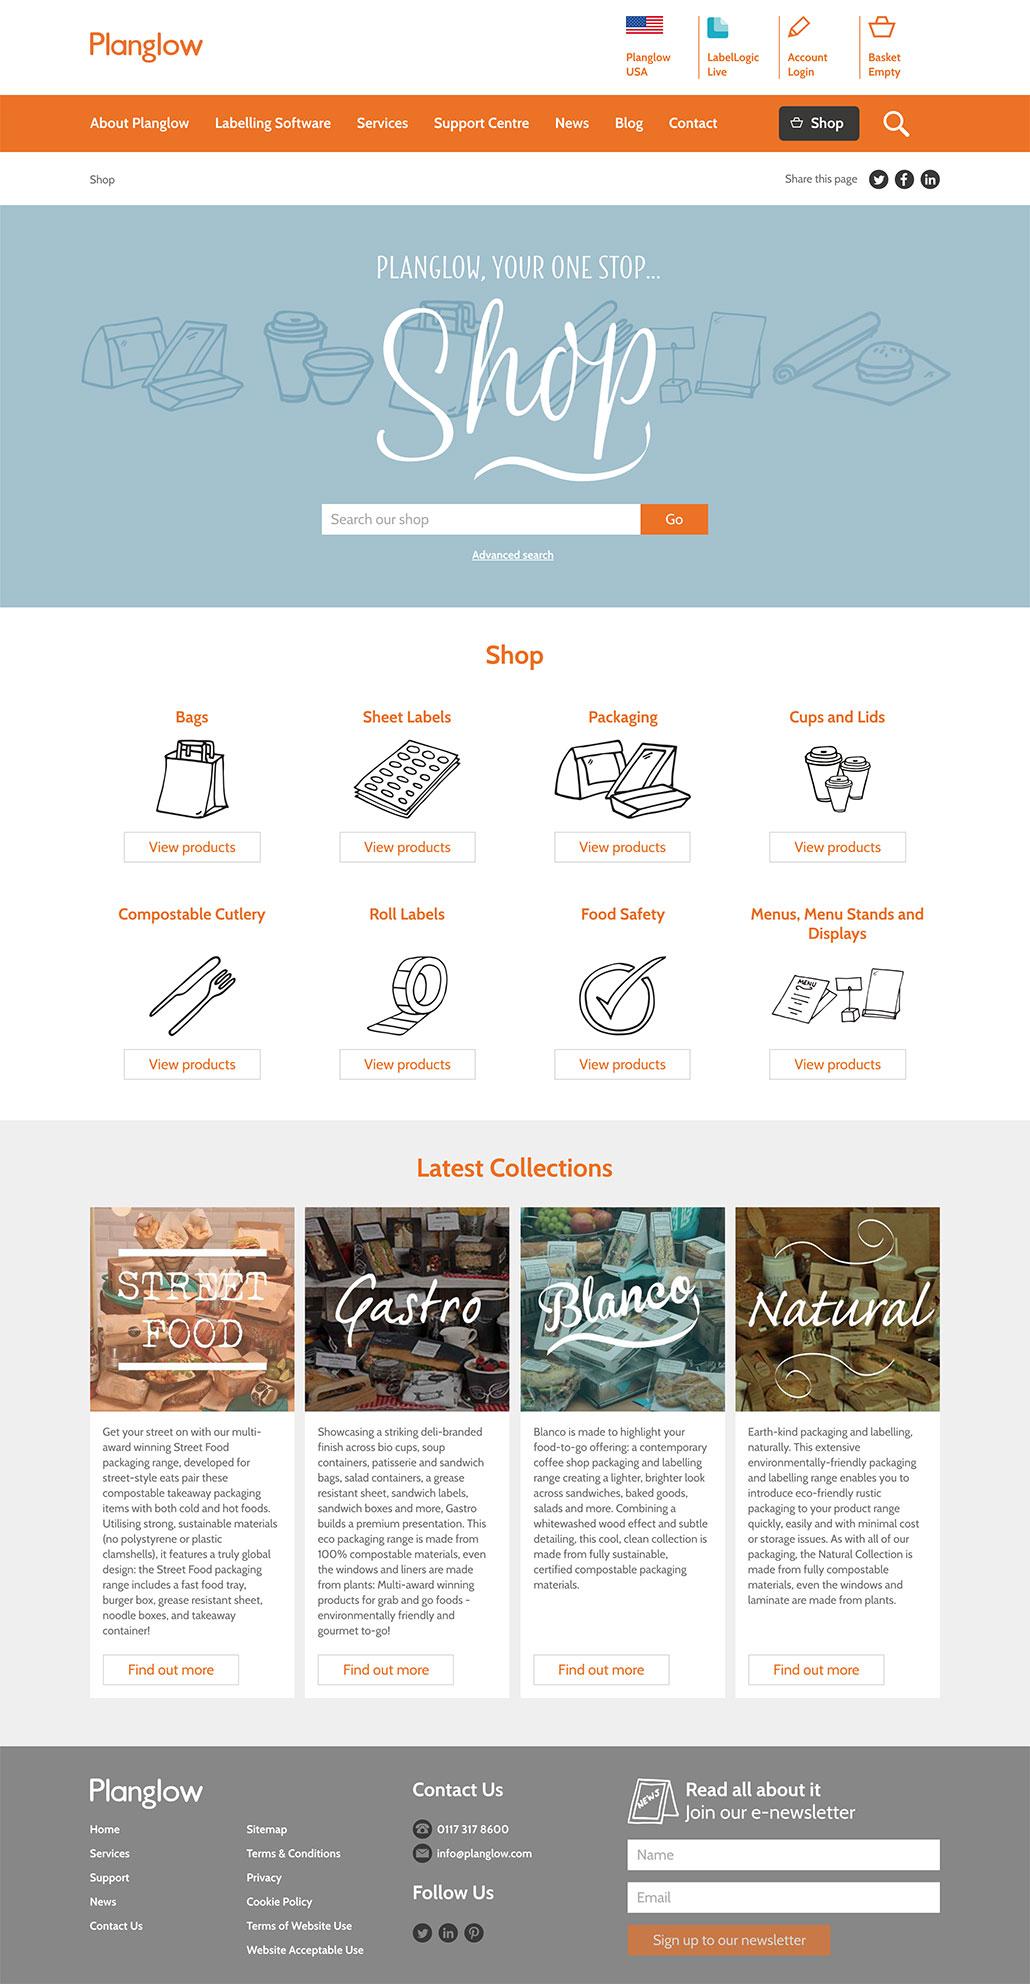 Planglow custom e-commerce website shop home screen 2